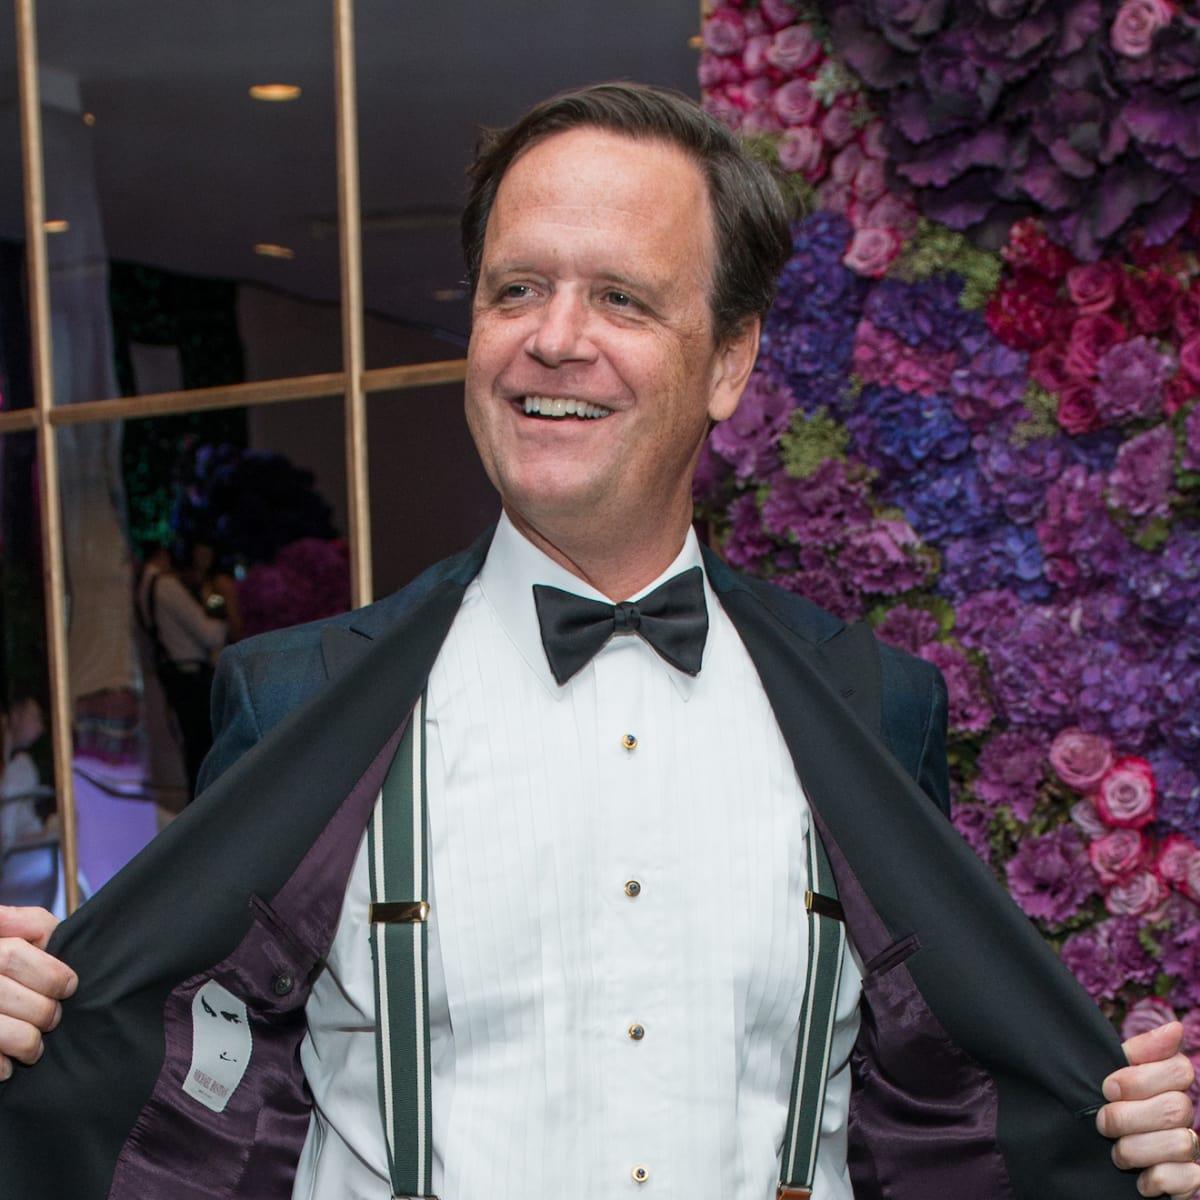 Christopher Gardner at MFAH Grand Gala Ball